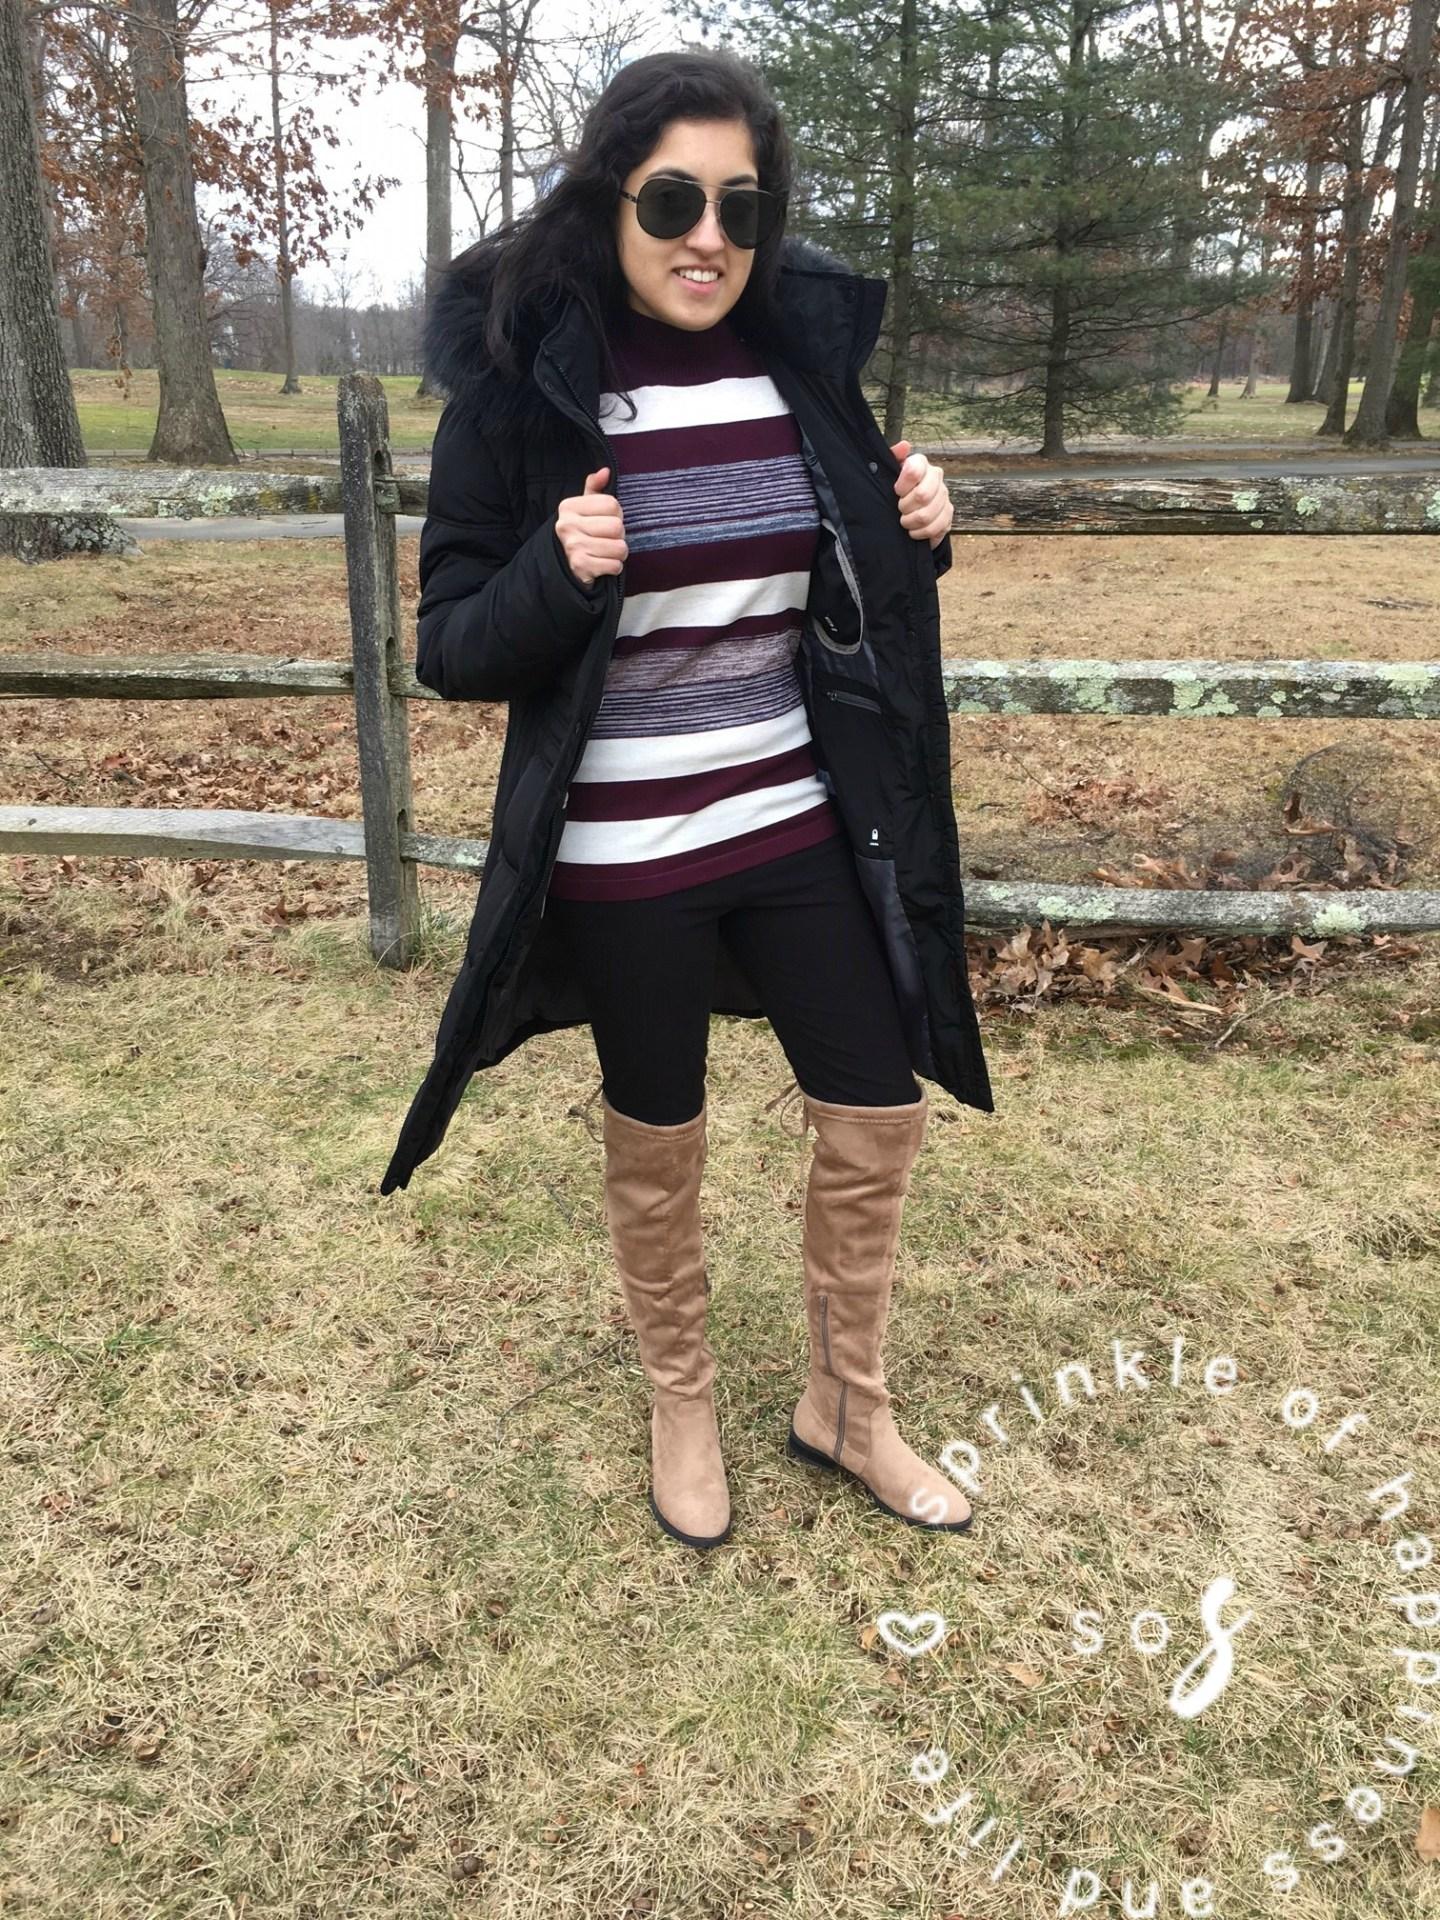 Cold Shoulder + OTK Boots! #ootd for Valentine's Day!